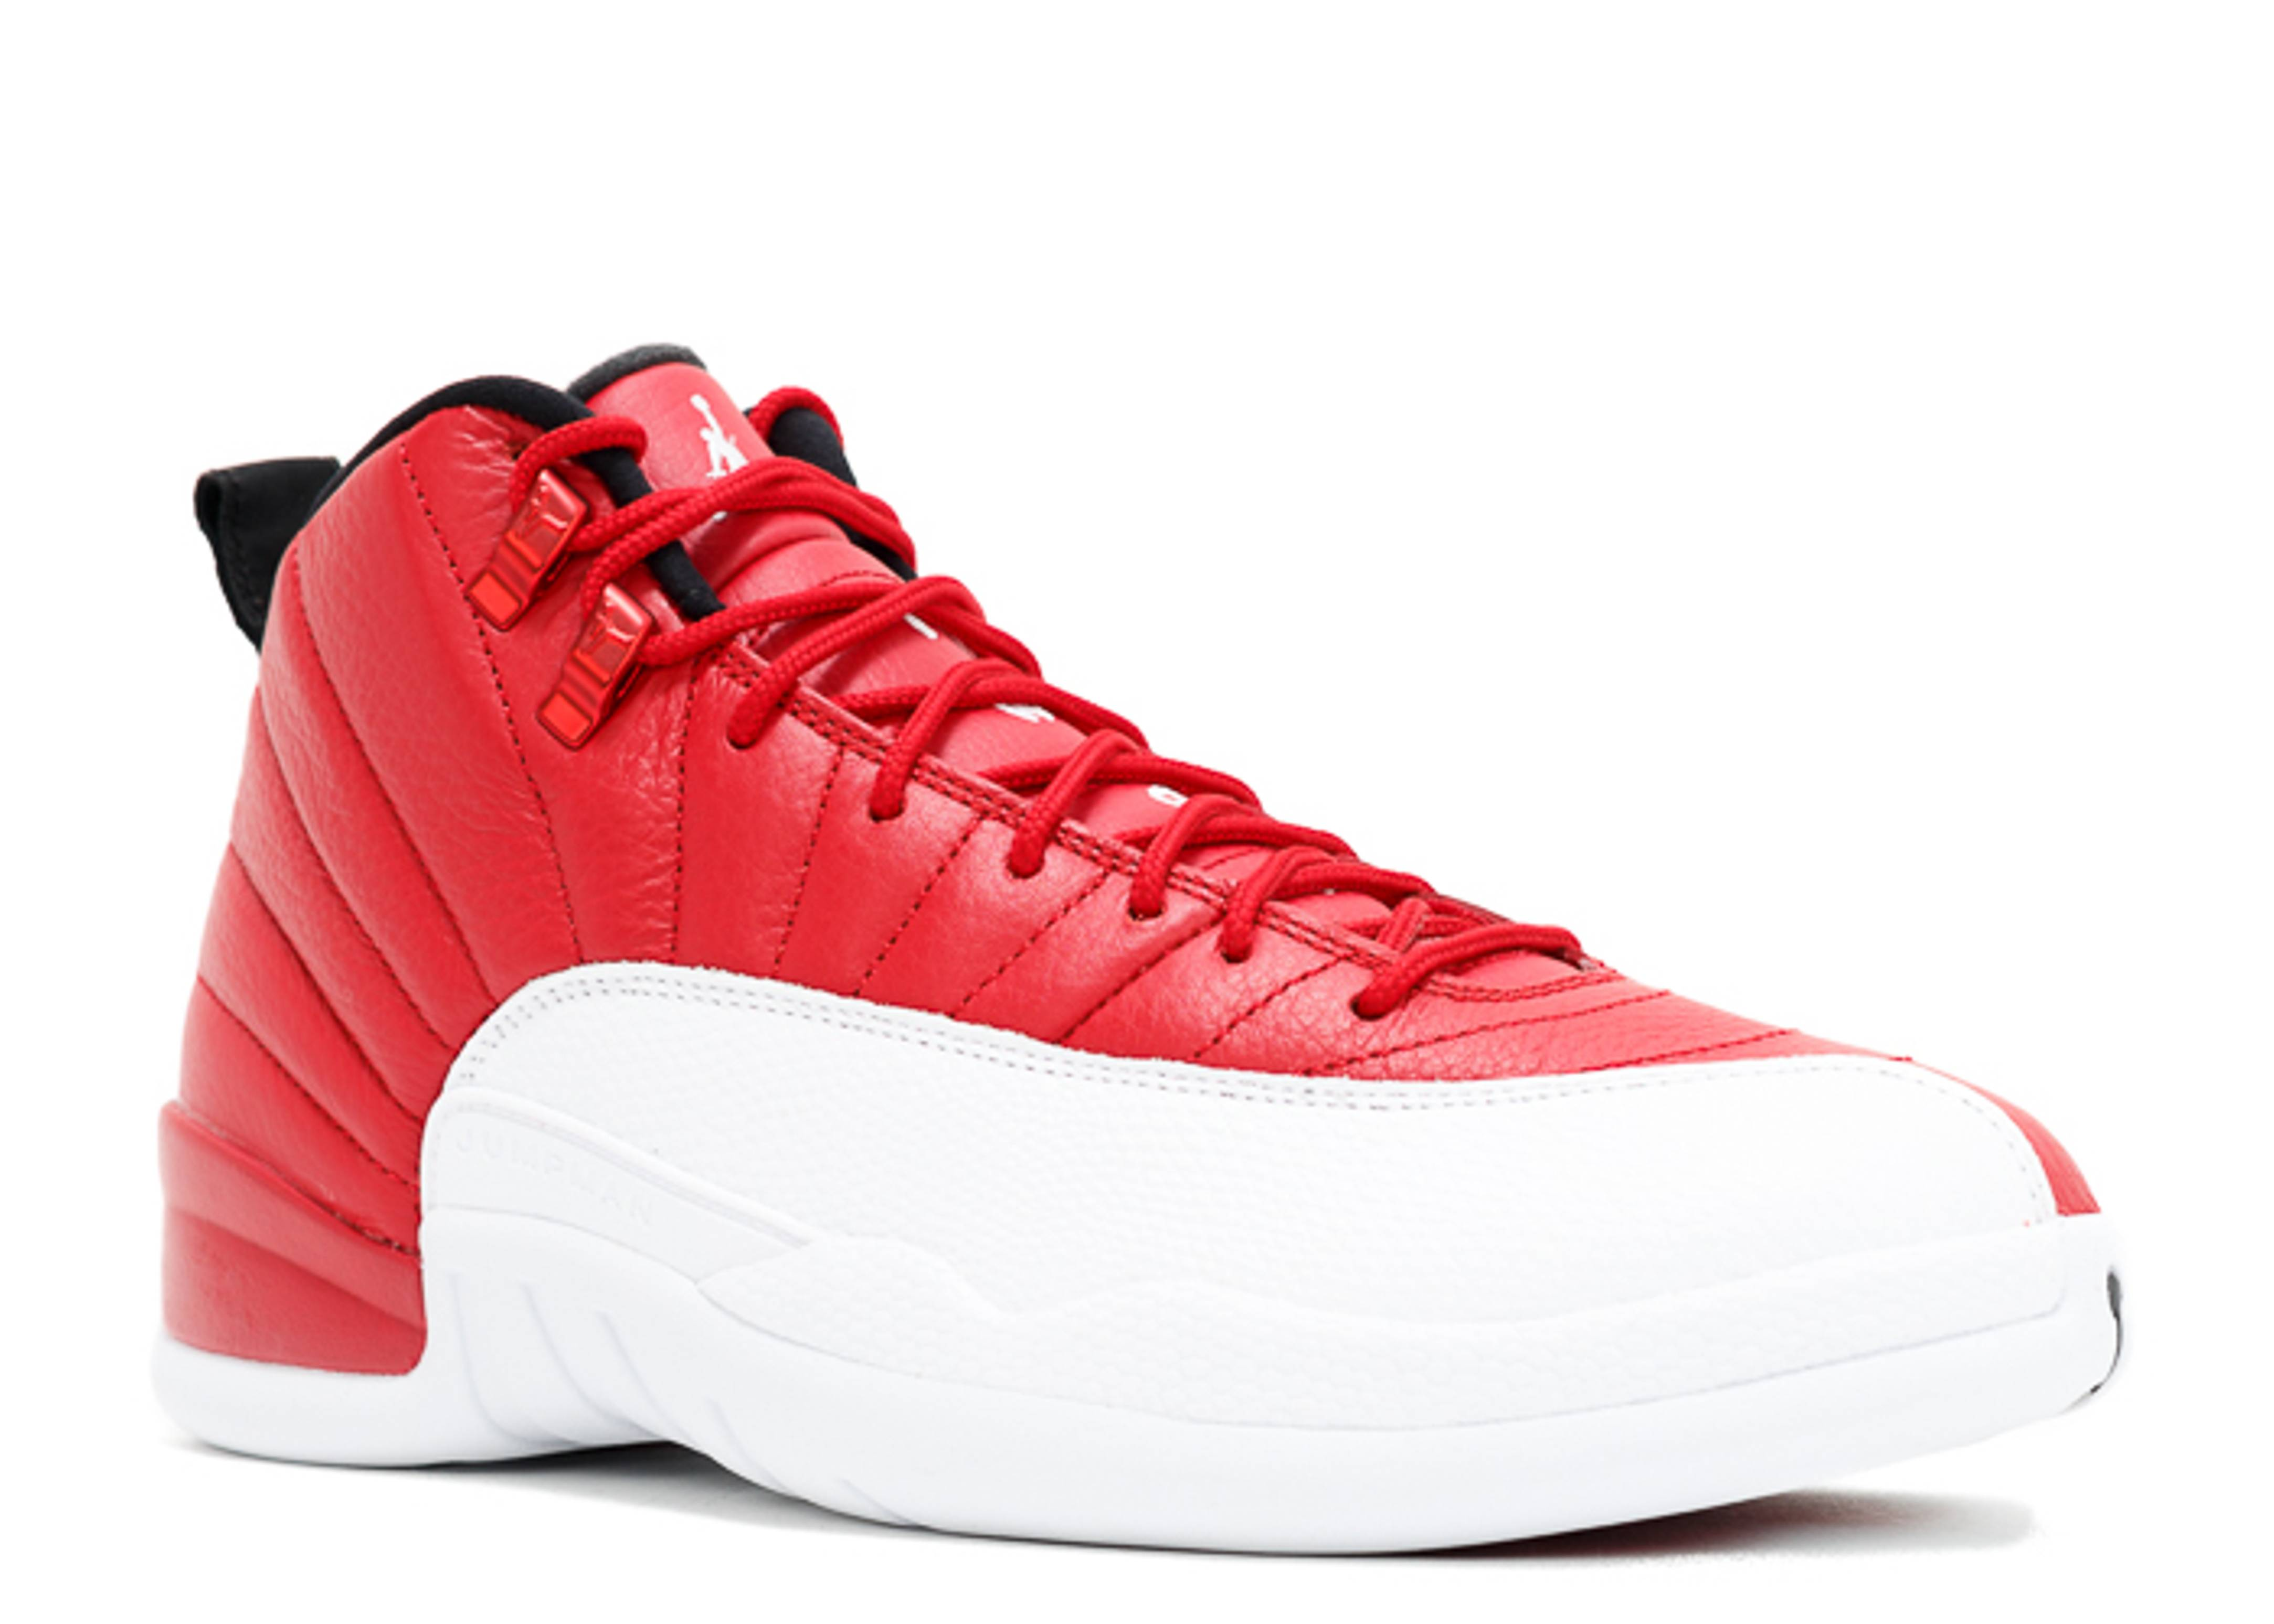 Jordan 12 Gym